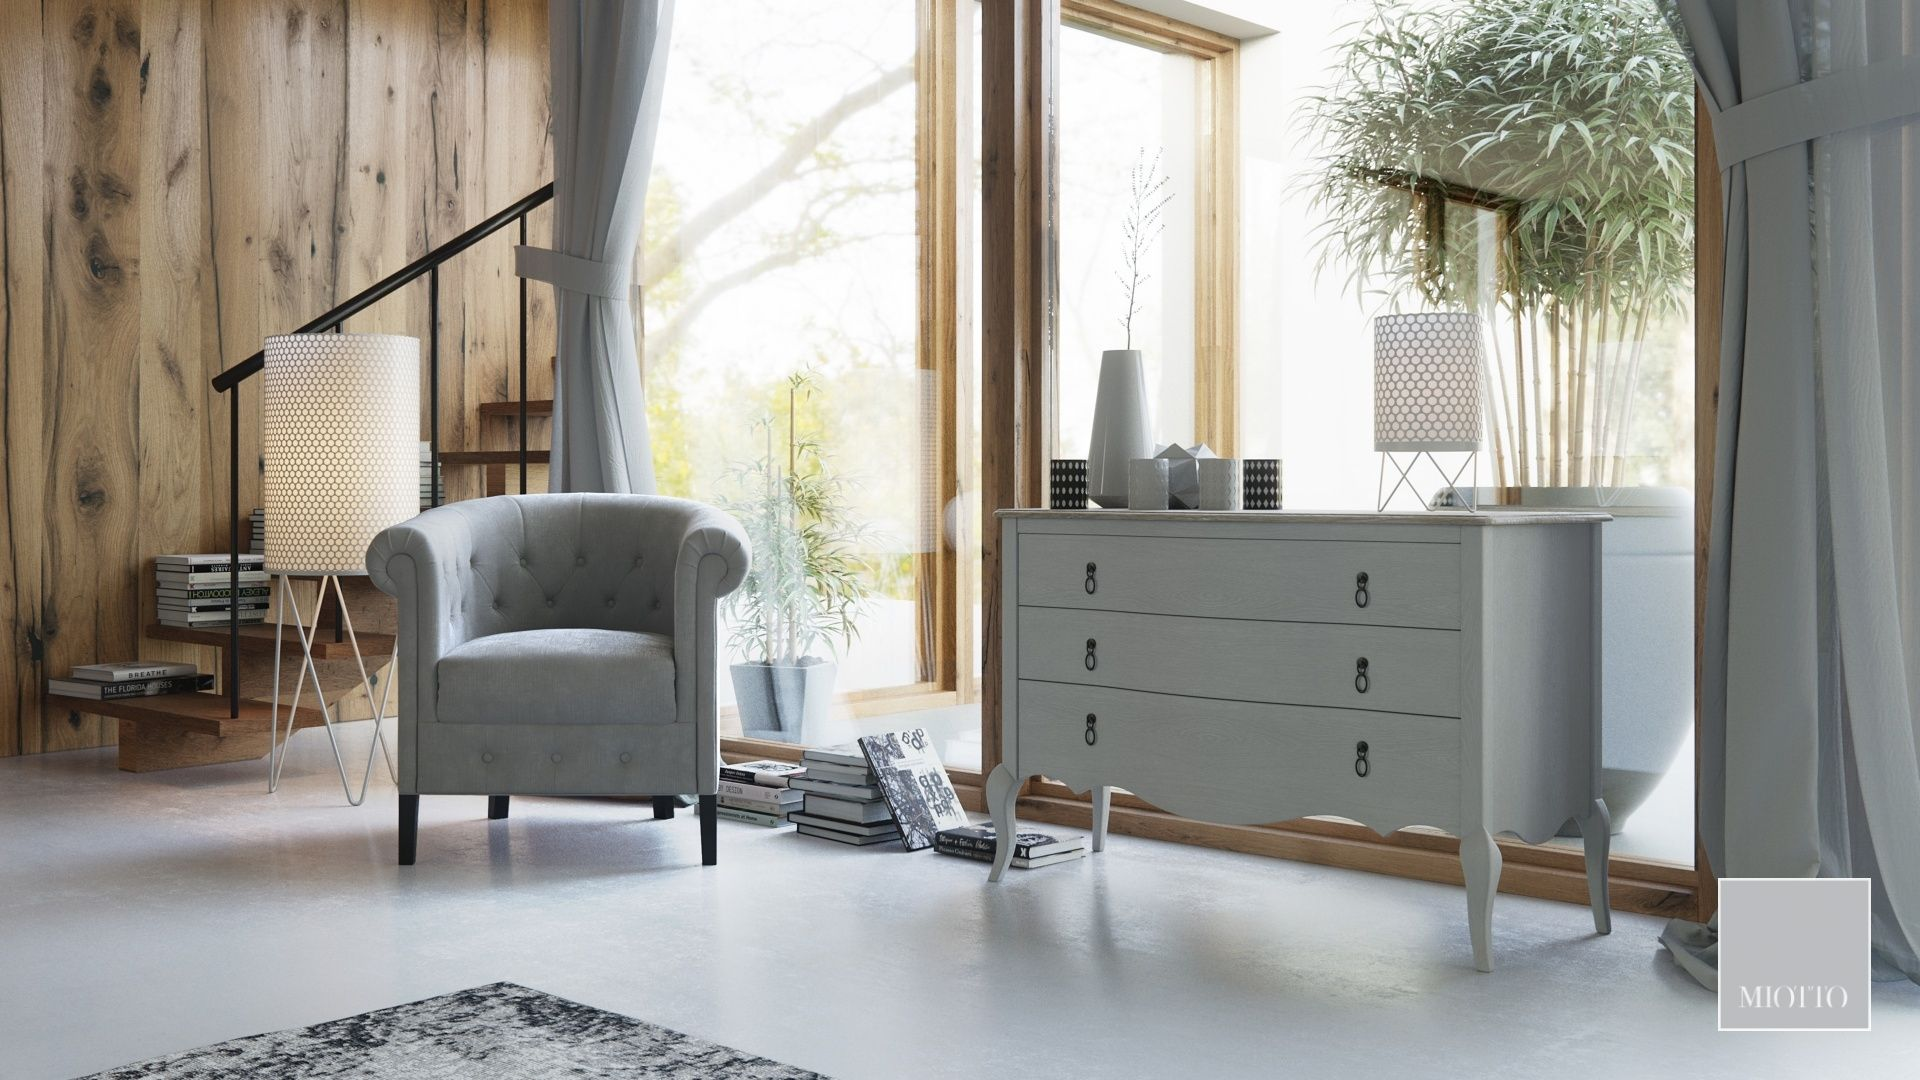 miotto_gala dresser, pitto lchr, fionia floor, fionia table